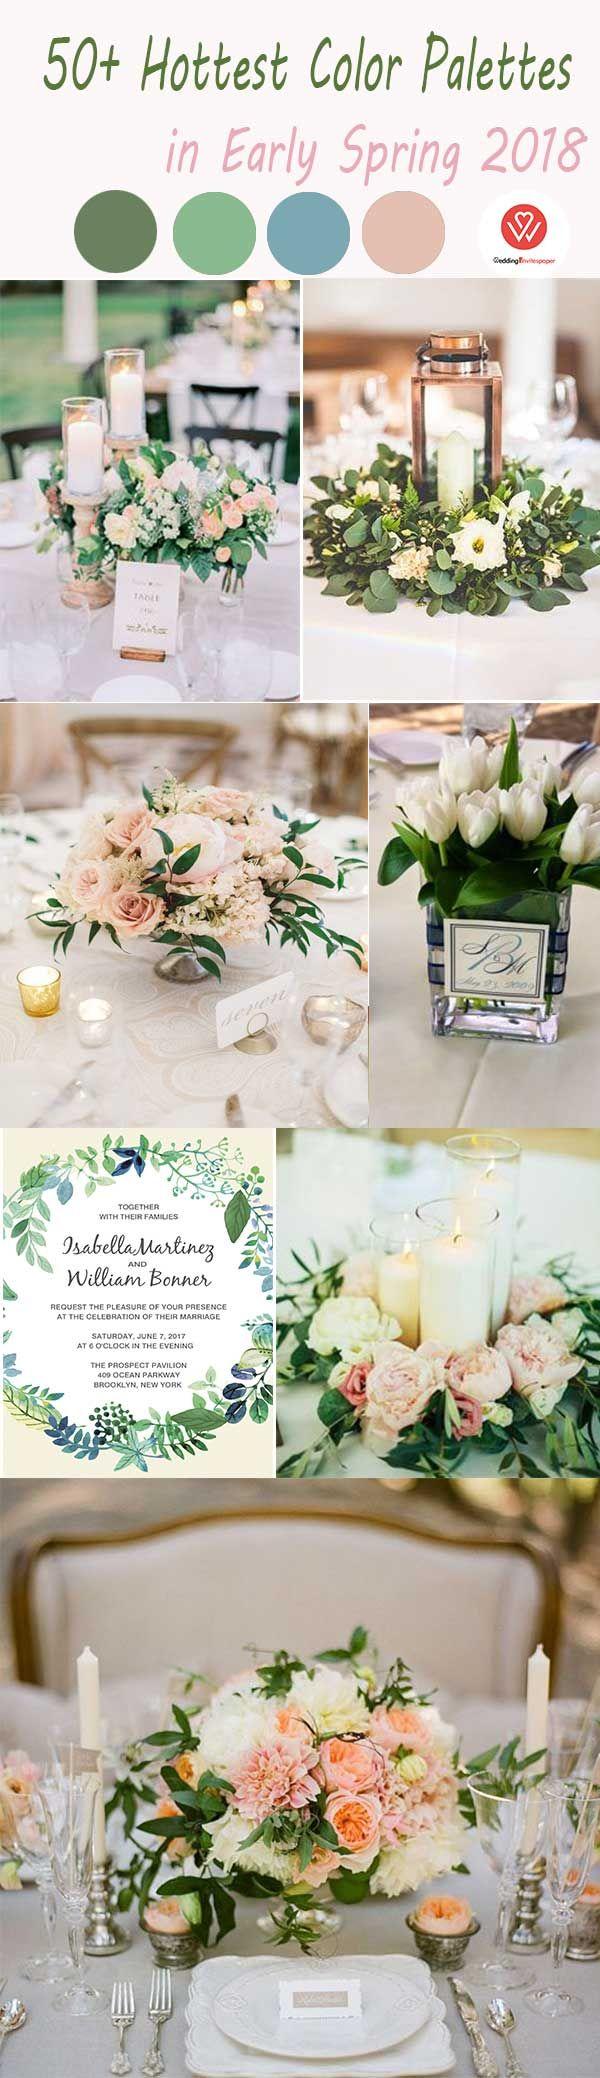 Best 25+ Early spring wedding ideas on Pinterest | Late summer ...